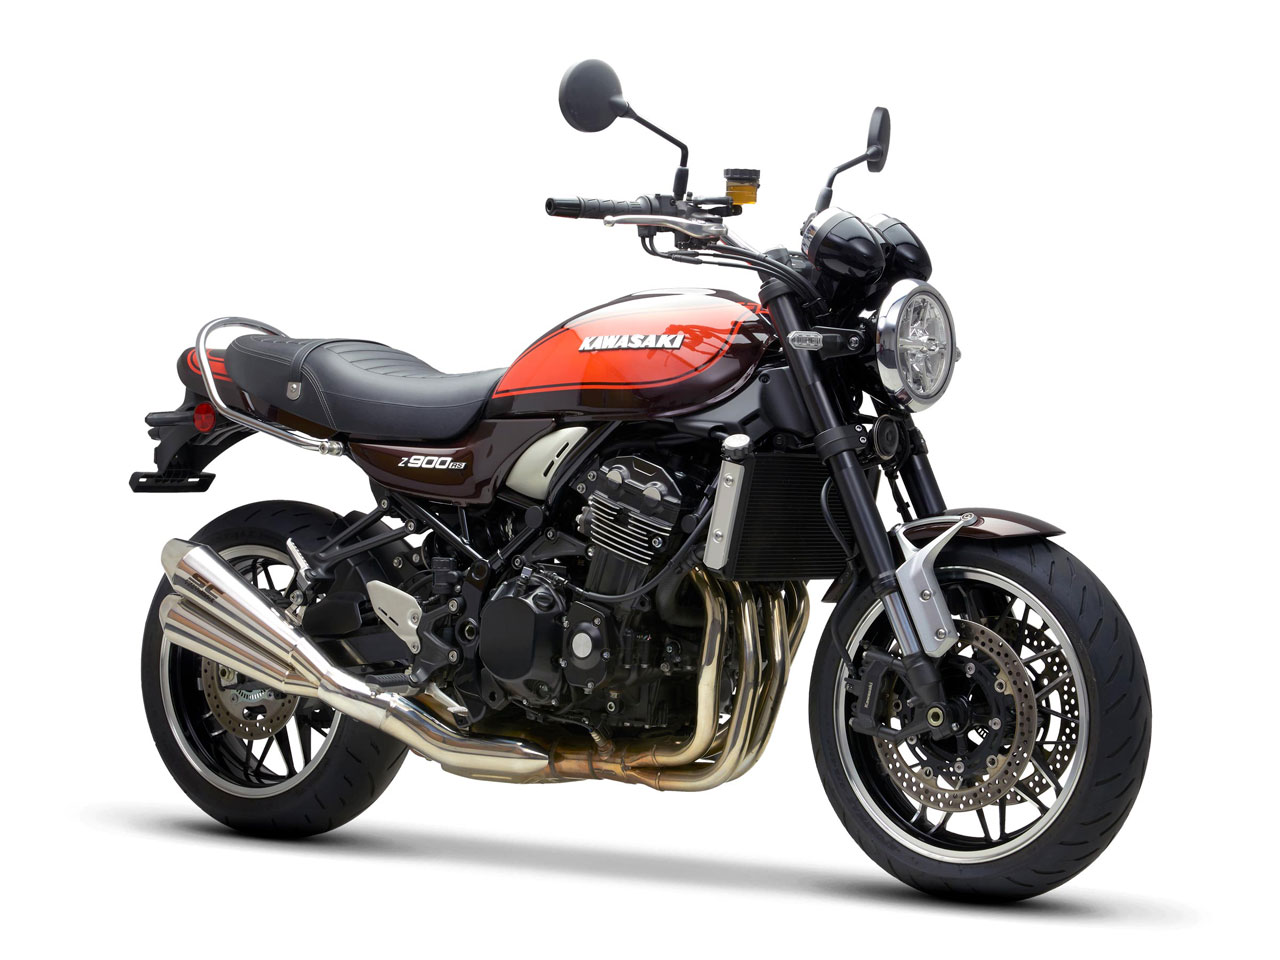 Kawasaki-Z900RS-Testanera_3-4-Anteriore_1280x960px_Web